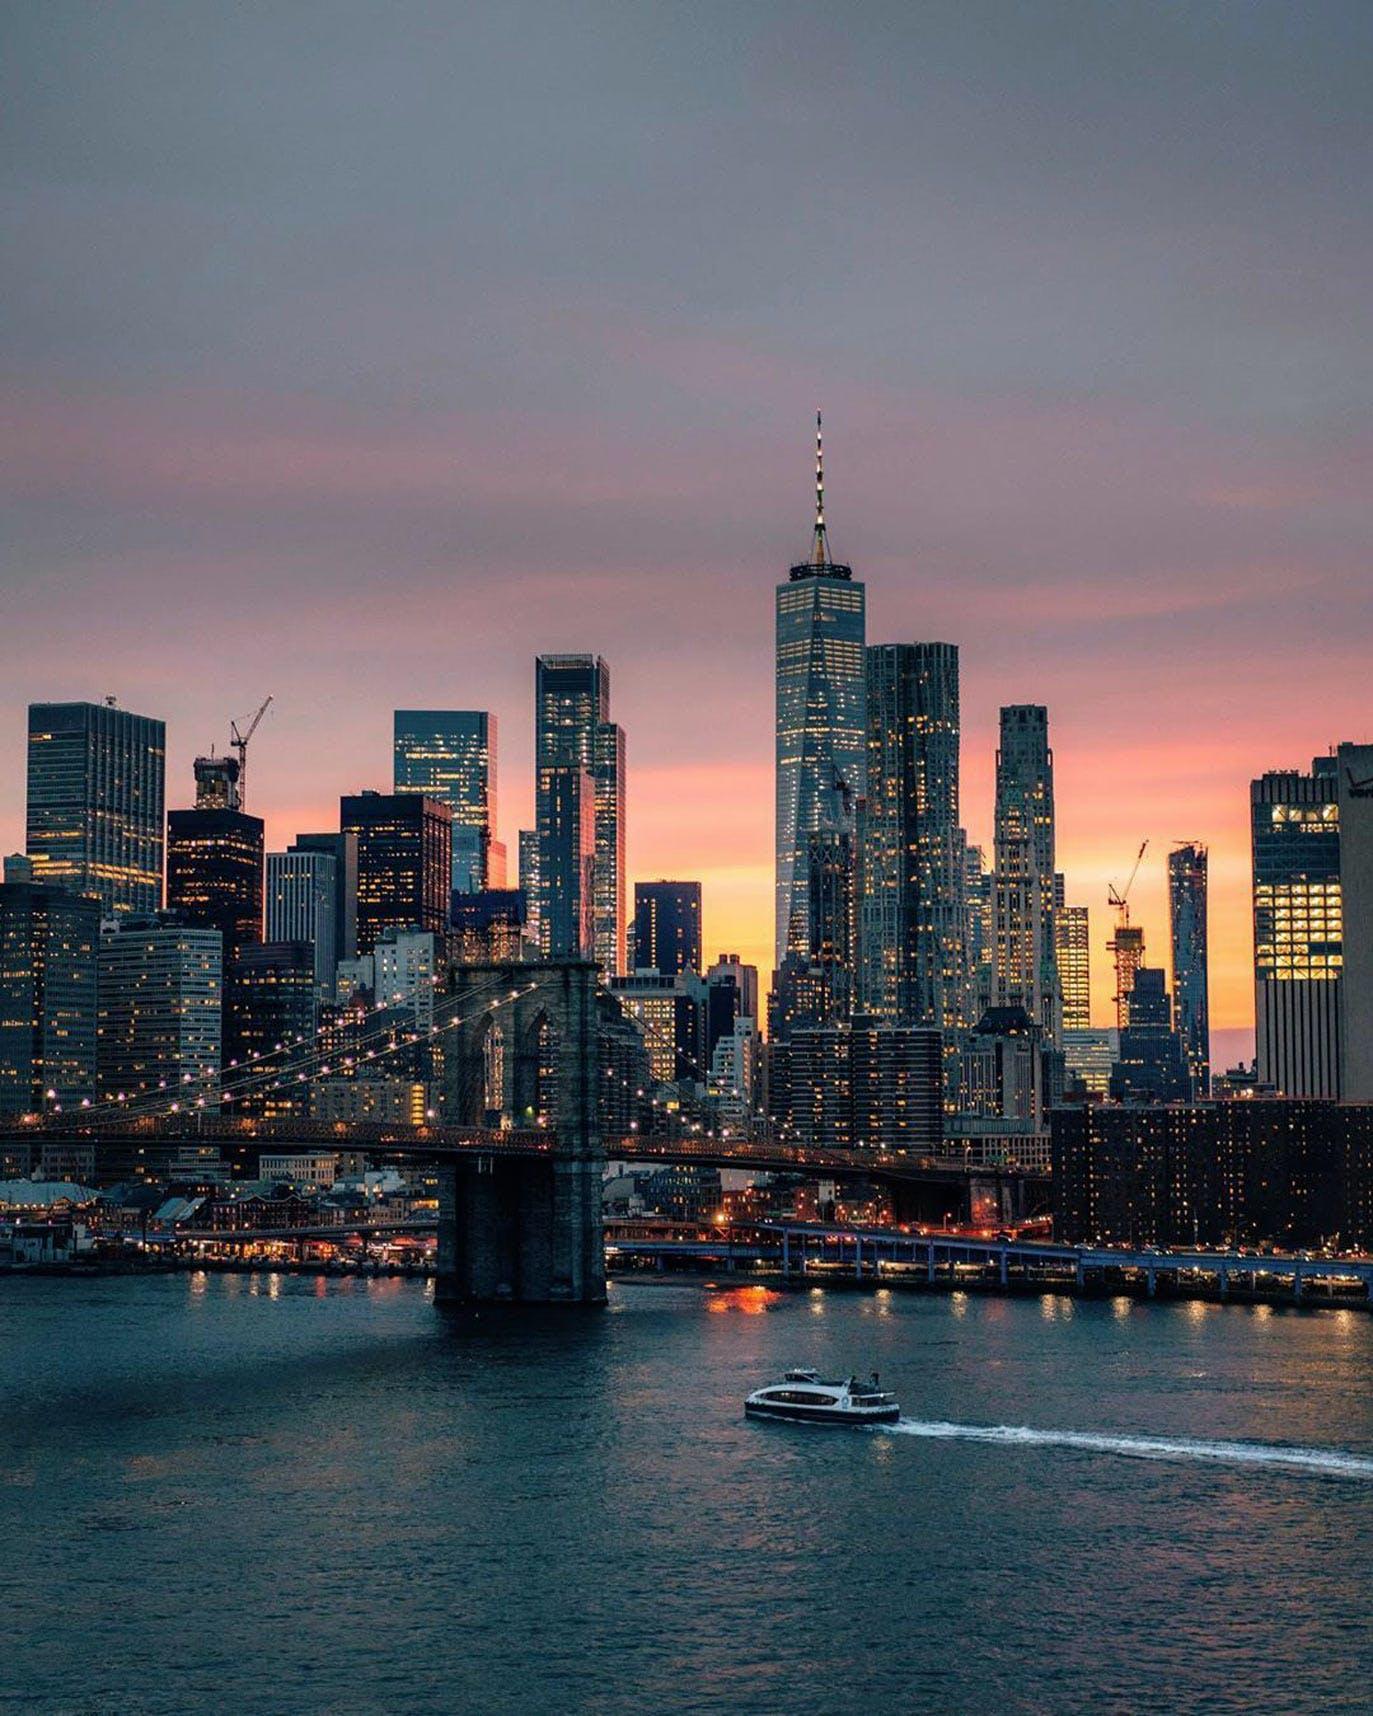 Manhattan Bridge view of East River, Brooklyn Bridge & One World Trade Center (Freedom Tower)